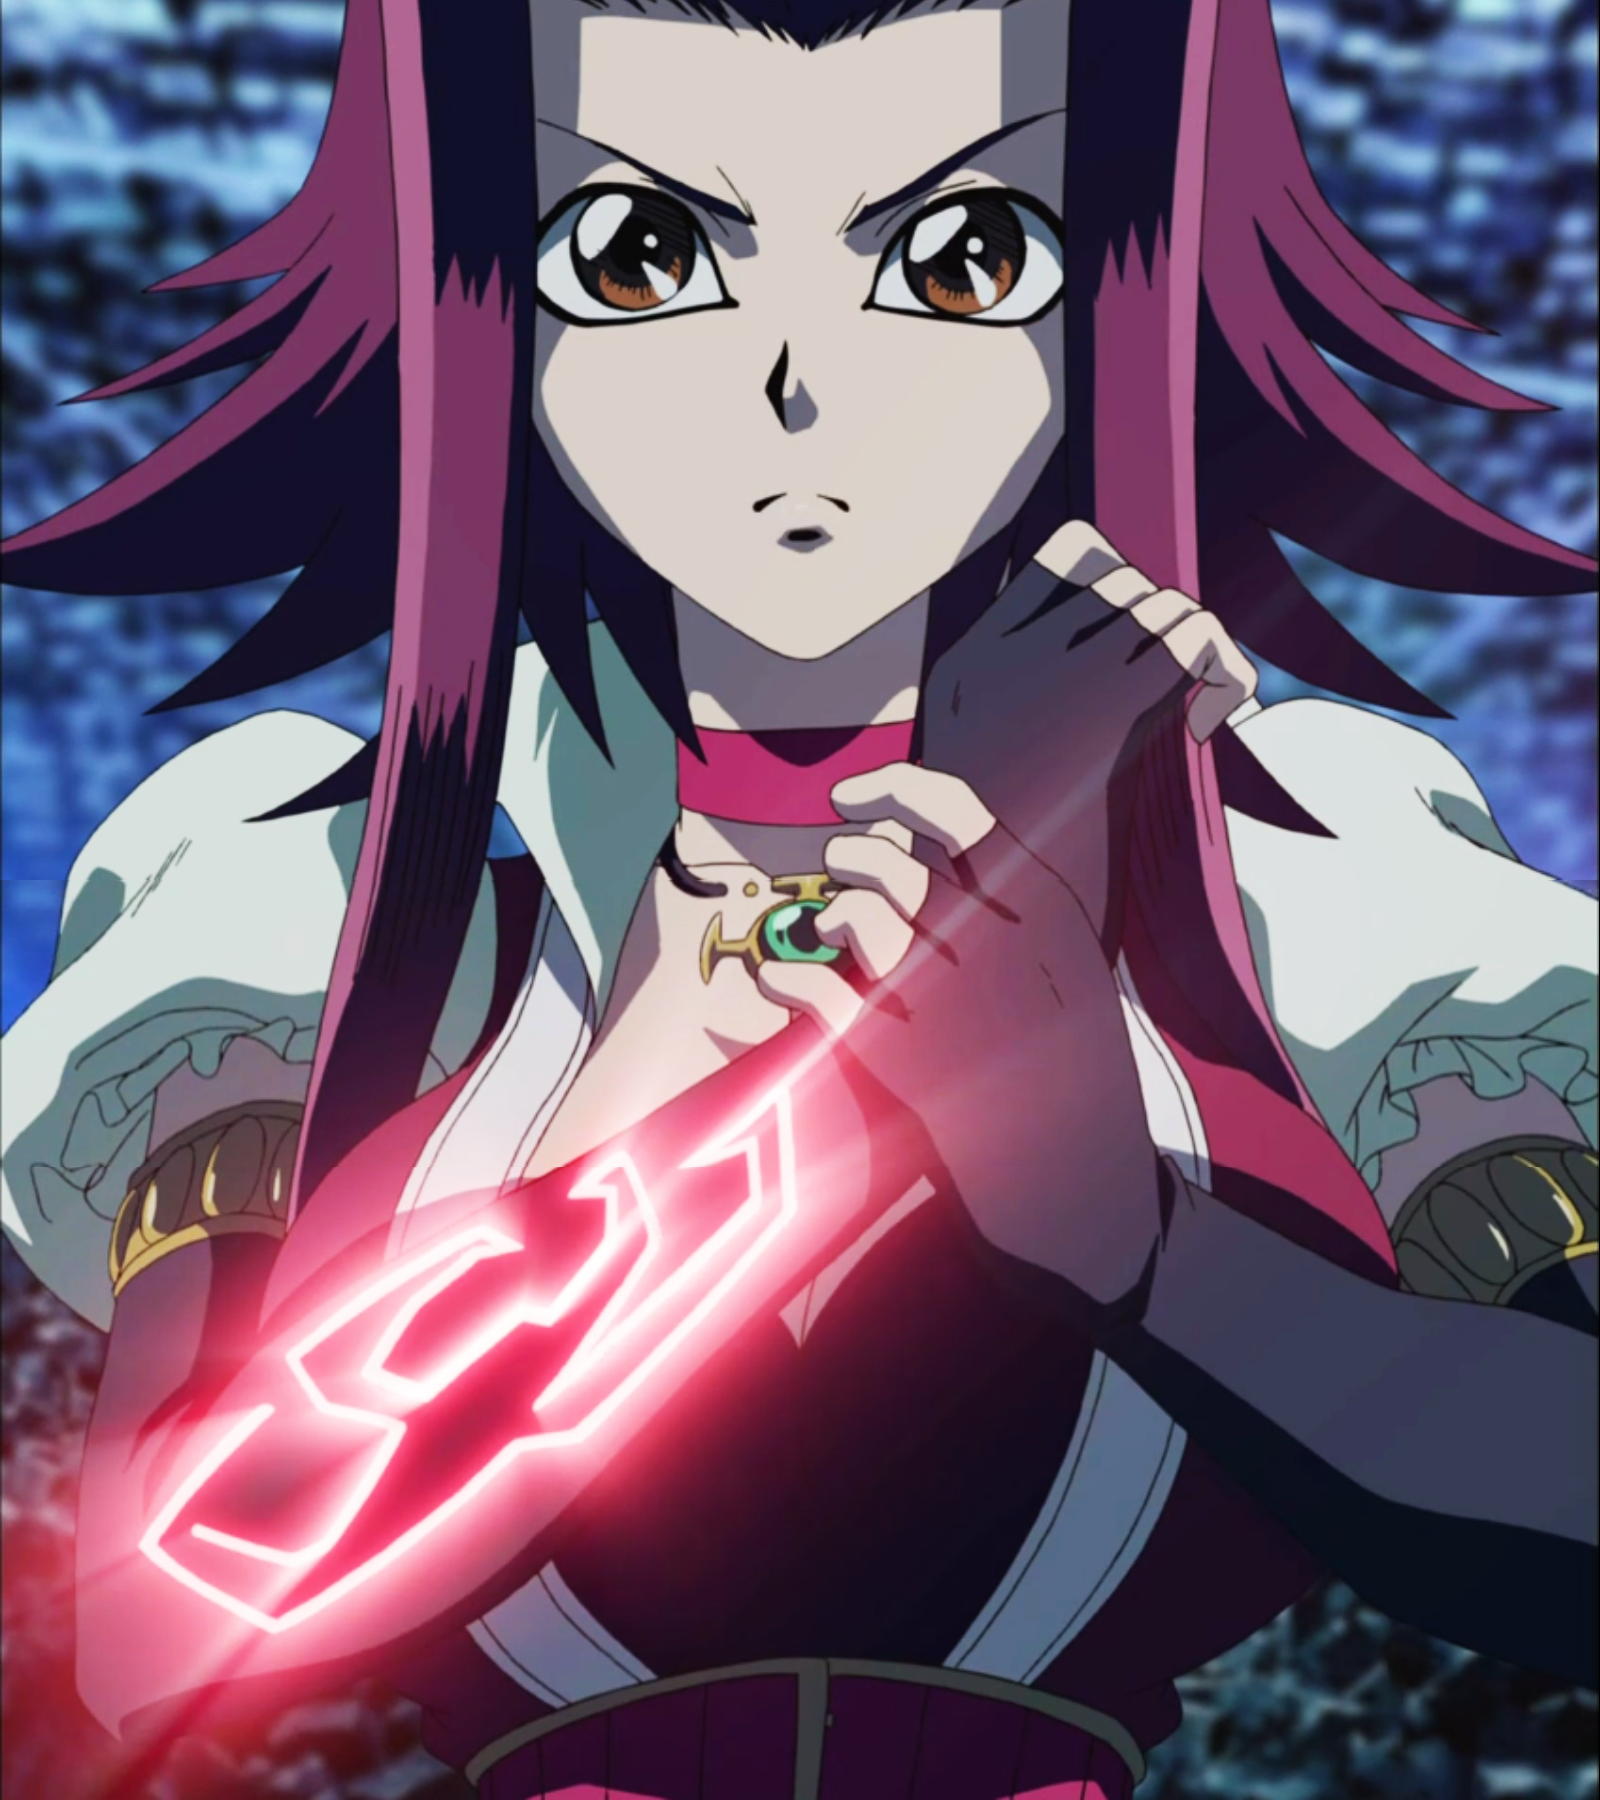 Aki Izayoi signer mark 5DS Yugioh, Anime red hair, Anime